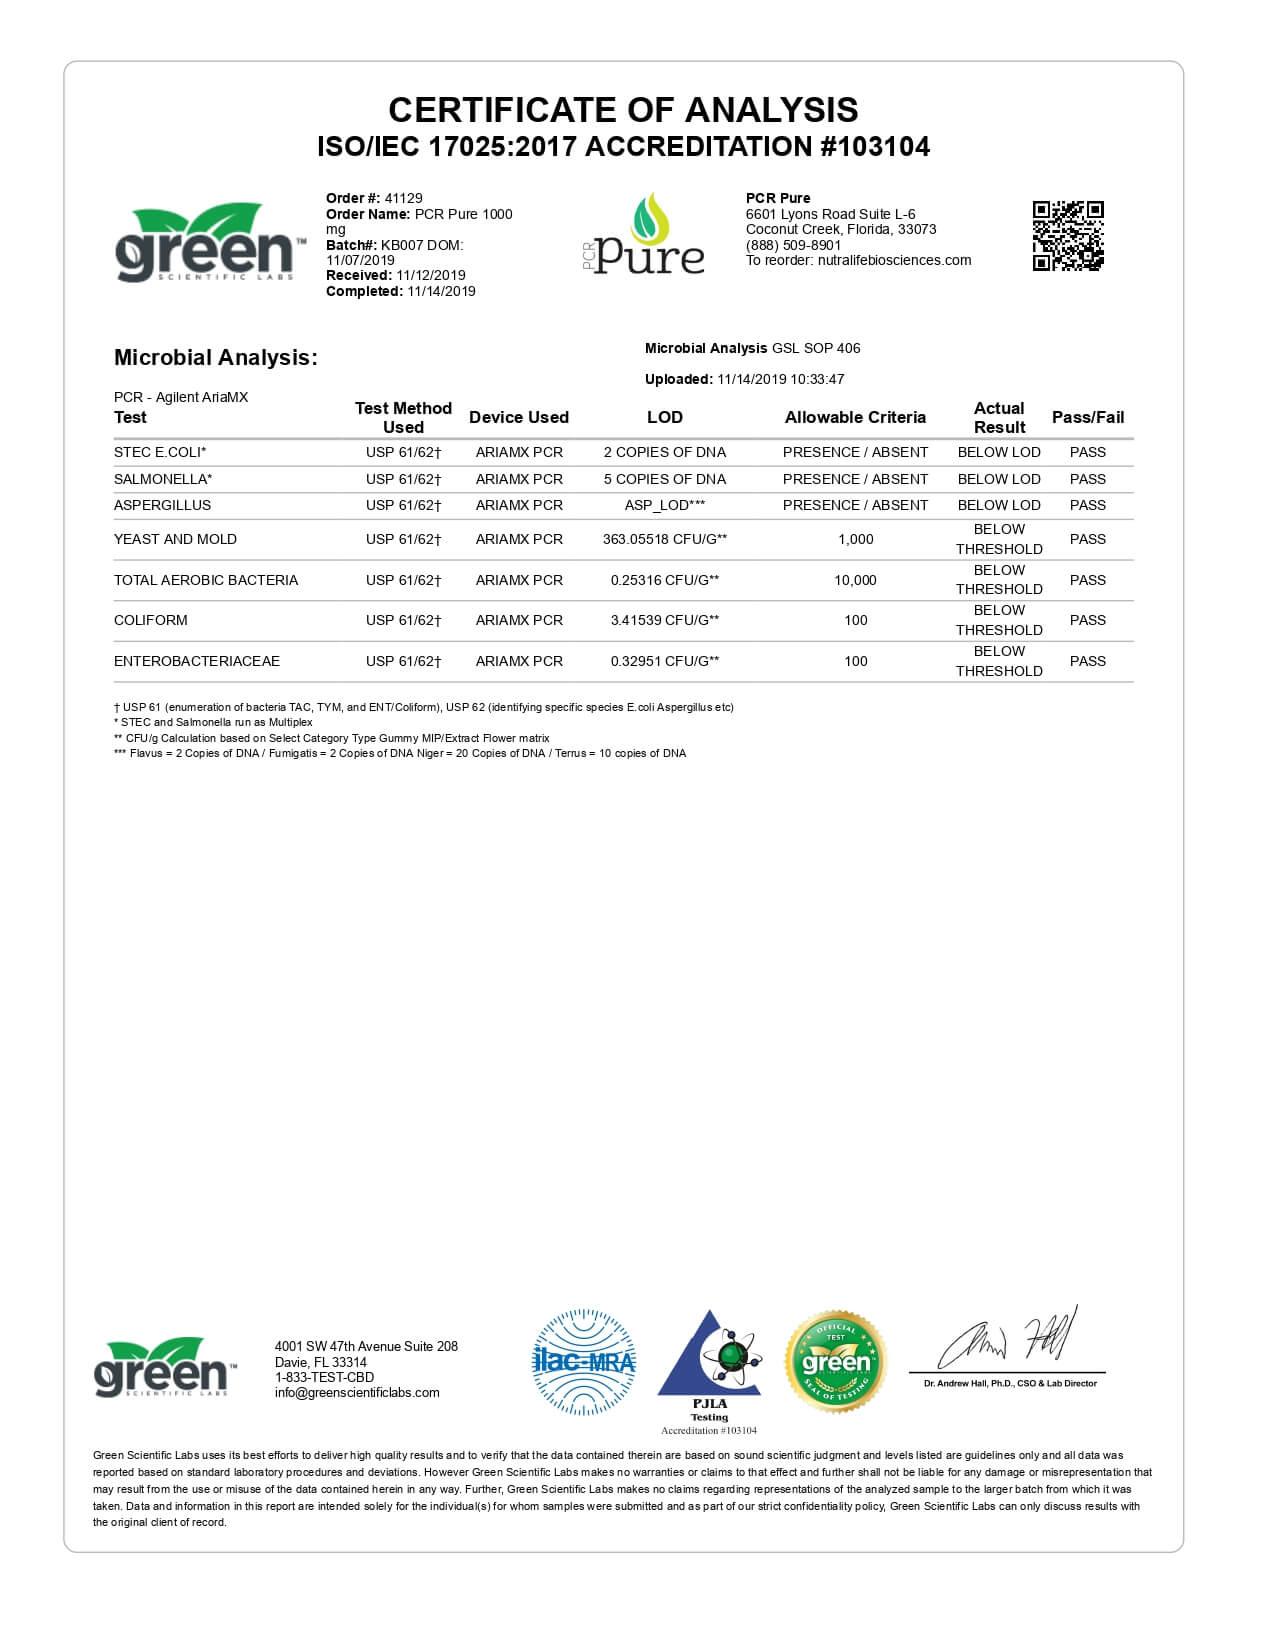 PCR Pure CBD Tincture Spray Full Spectrum 1000mg Lab Report